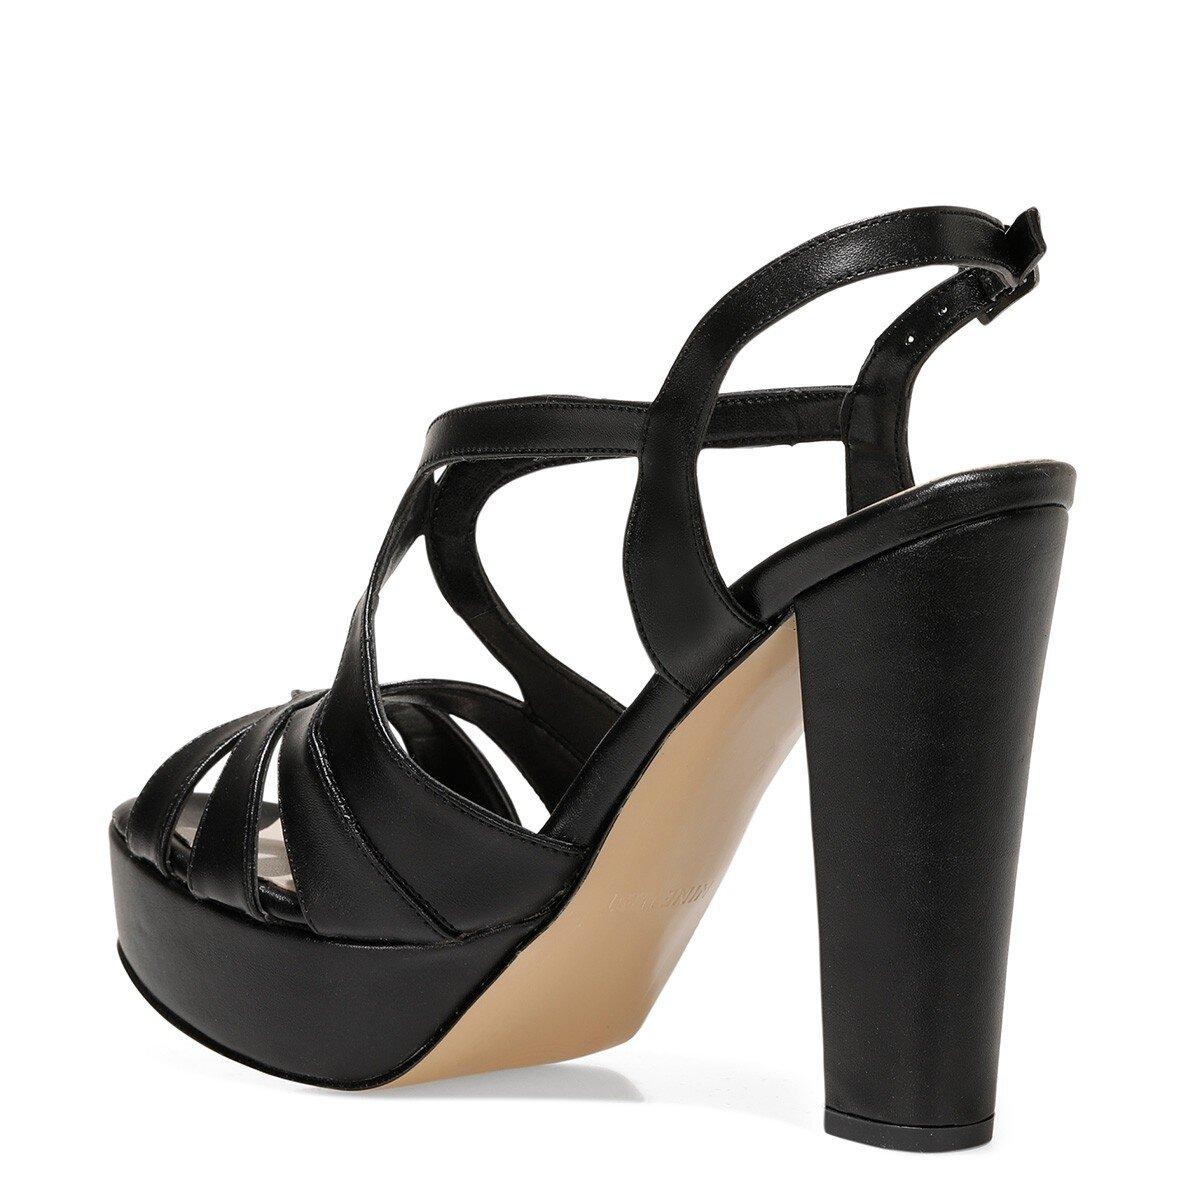 SINDY 1FX Siyah Kadın Topuklu Sandalet